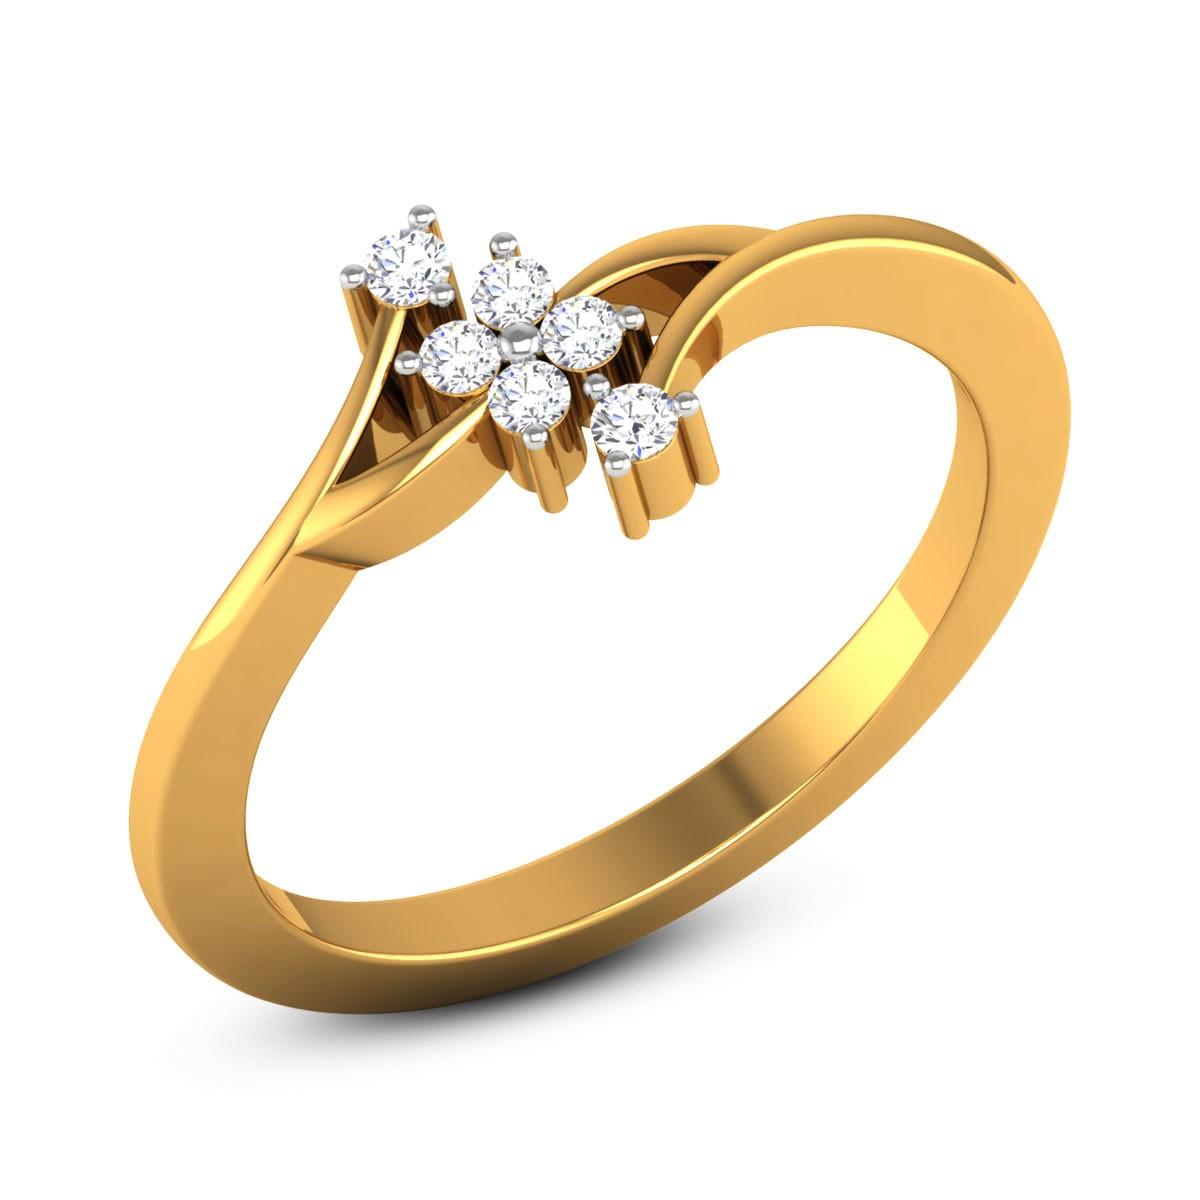 Anshula Diamond Floral Ring